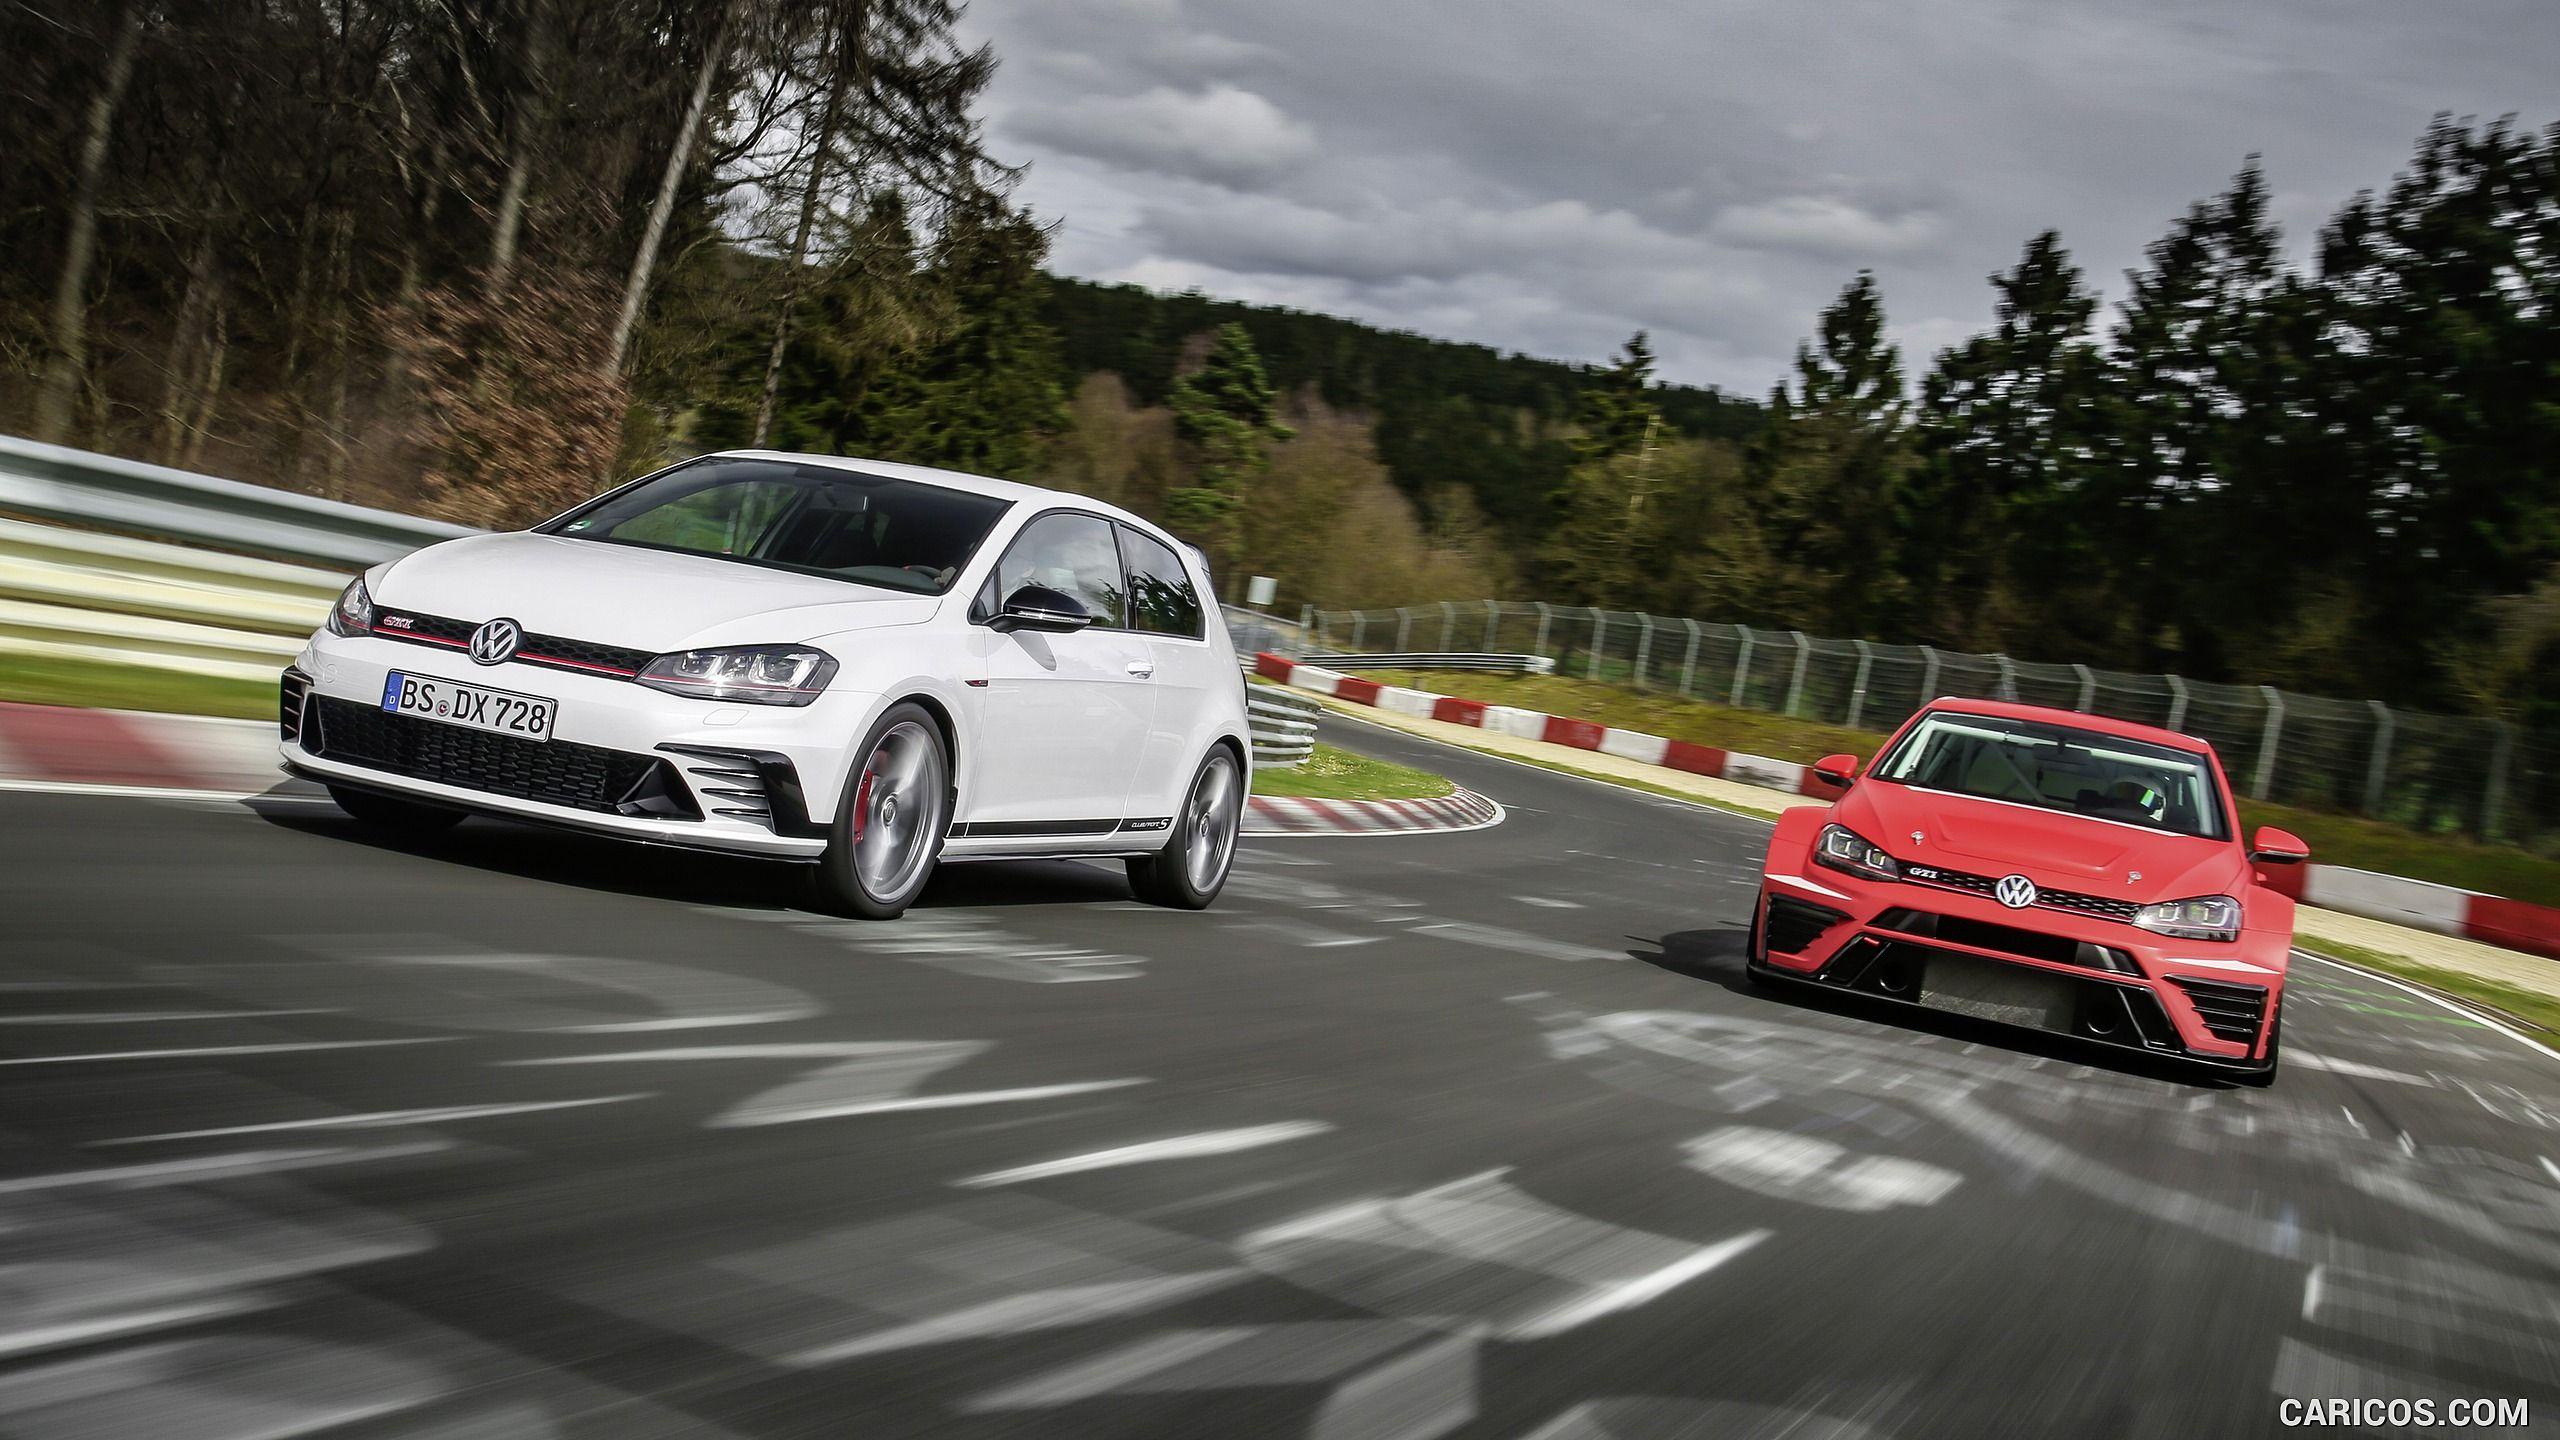 Volkswagen Golf Gti Clubsport S Smashes Own Nurburgring Record Autocar Golf Gti Volkswagen Golf Gti Volkswagen Golf